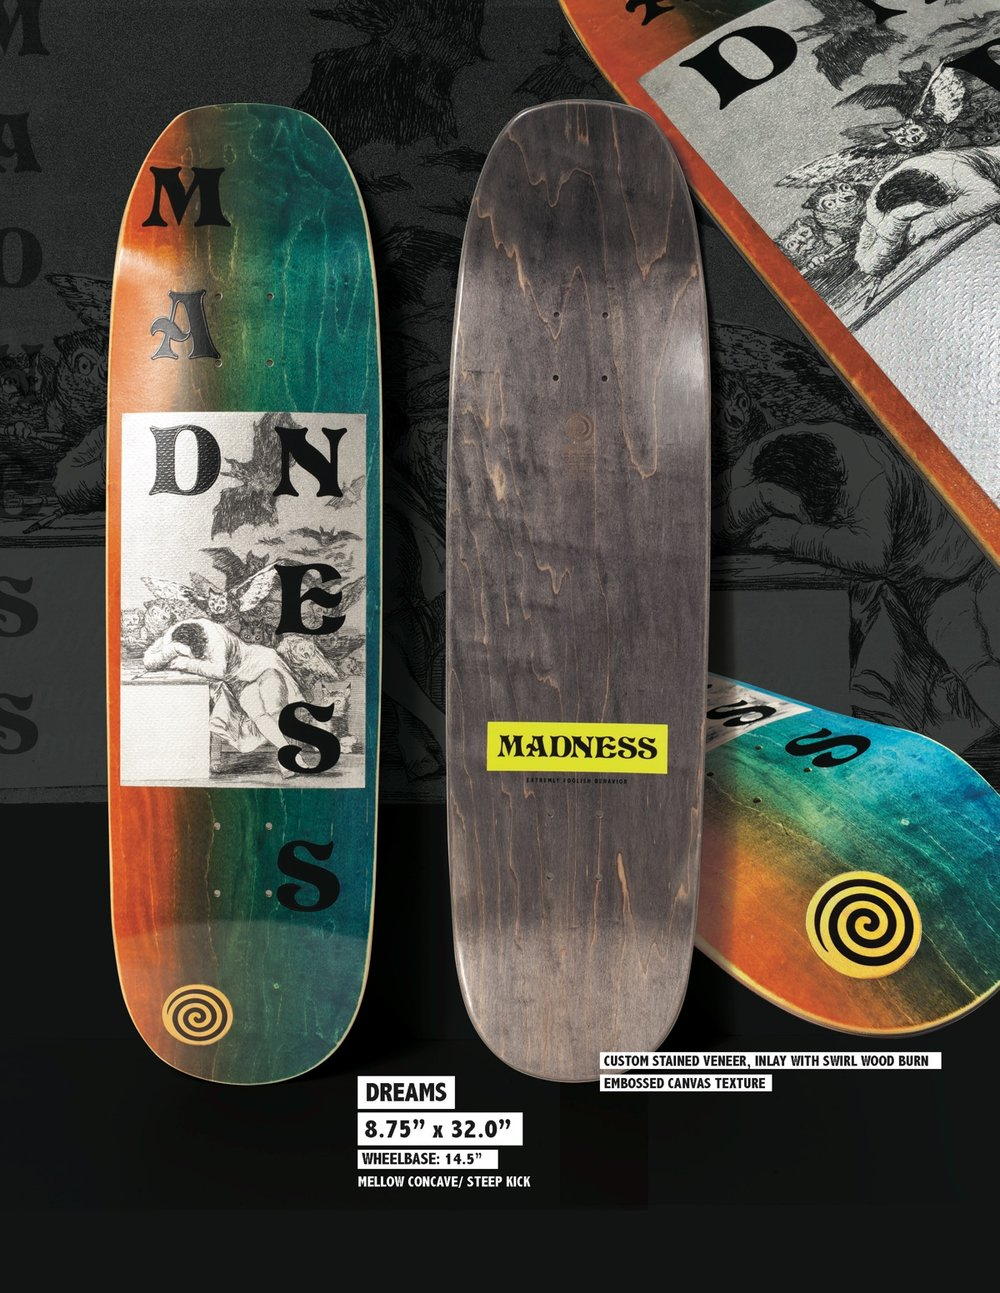 MADNESS Dreams 8.75 R7 Skateboard Deck